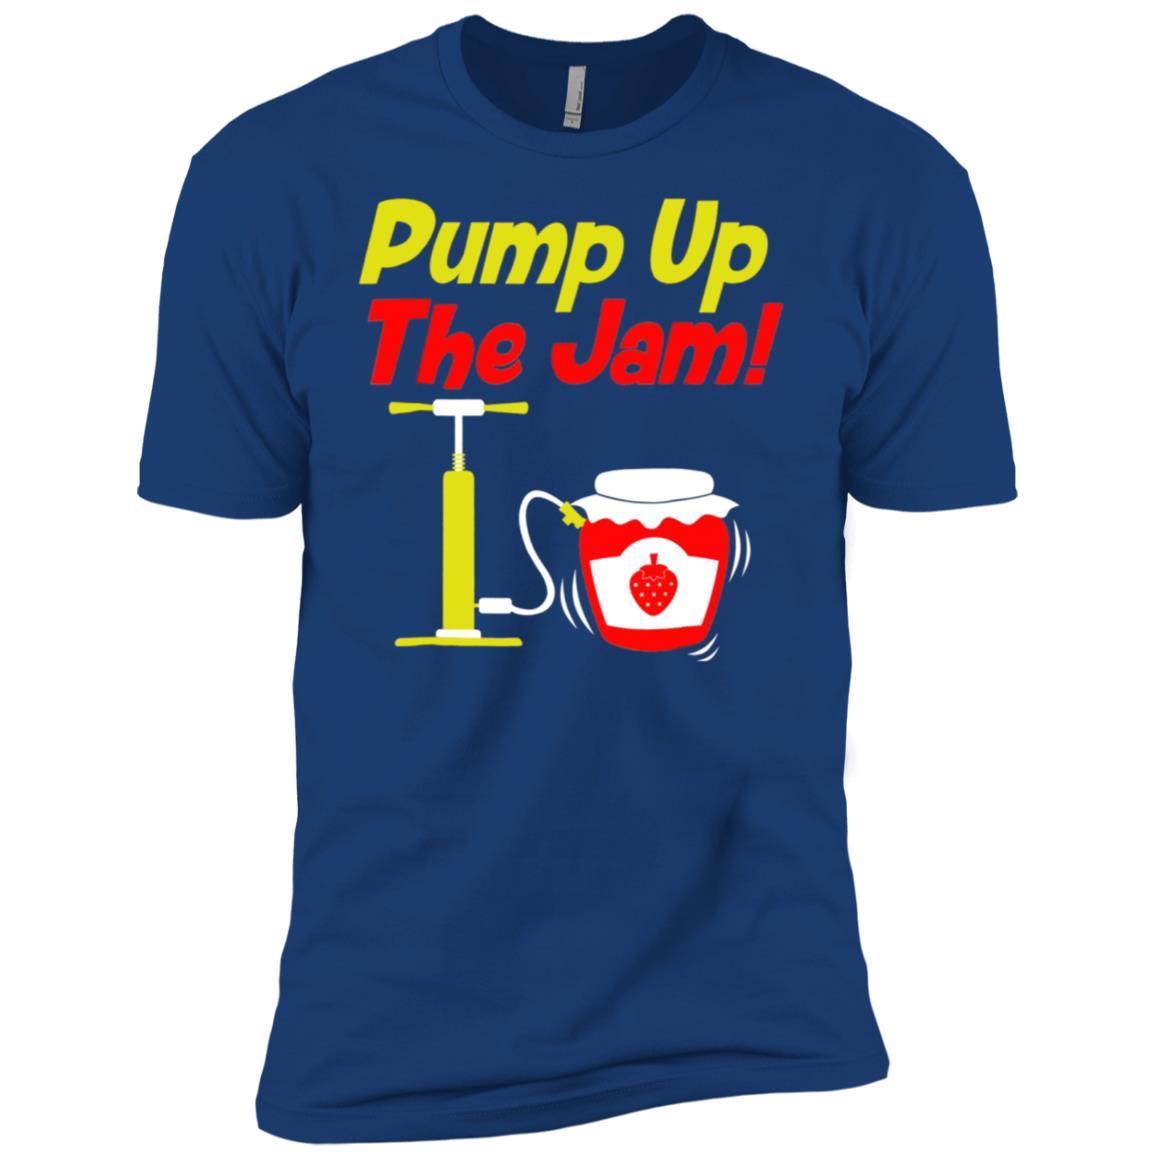 Pump Up The Jam, Pump It Up! – Funny 90s Music Parody Tee Men Short Sleeve T-Shirt